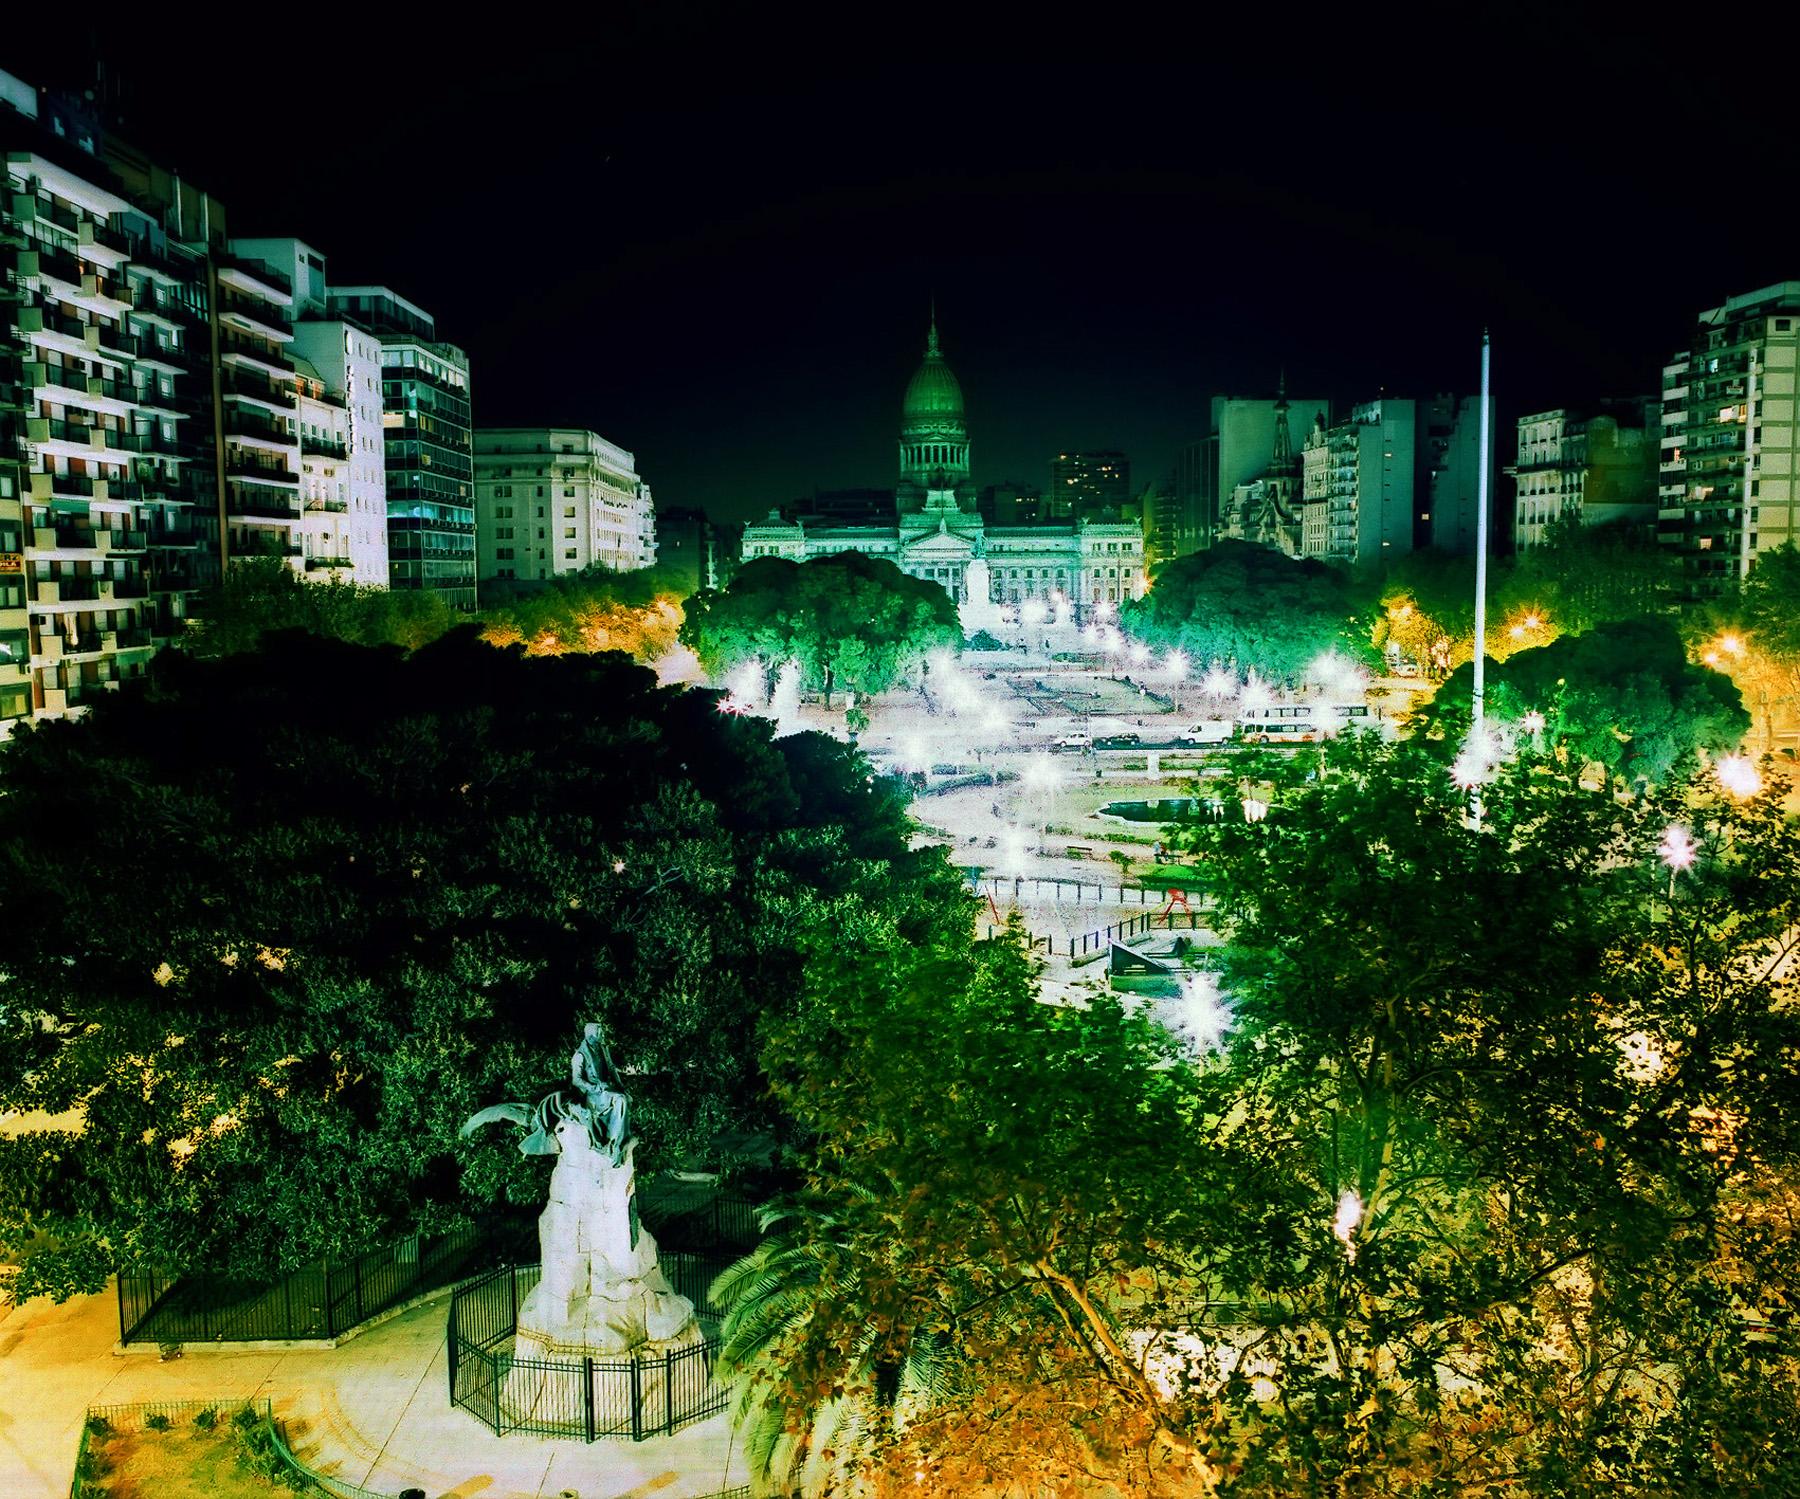 La luz argentina